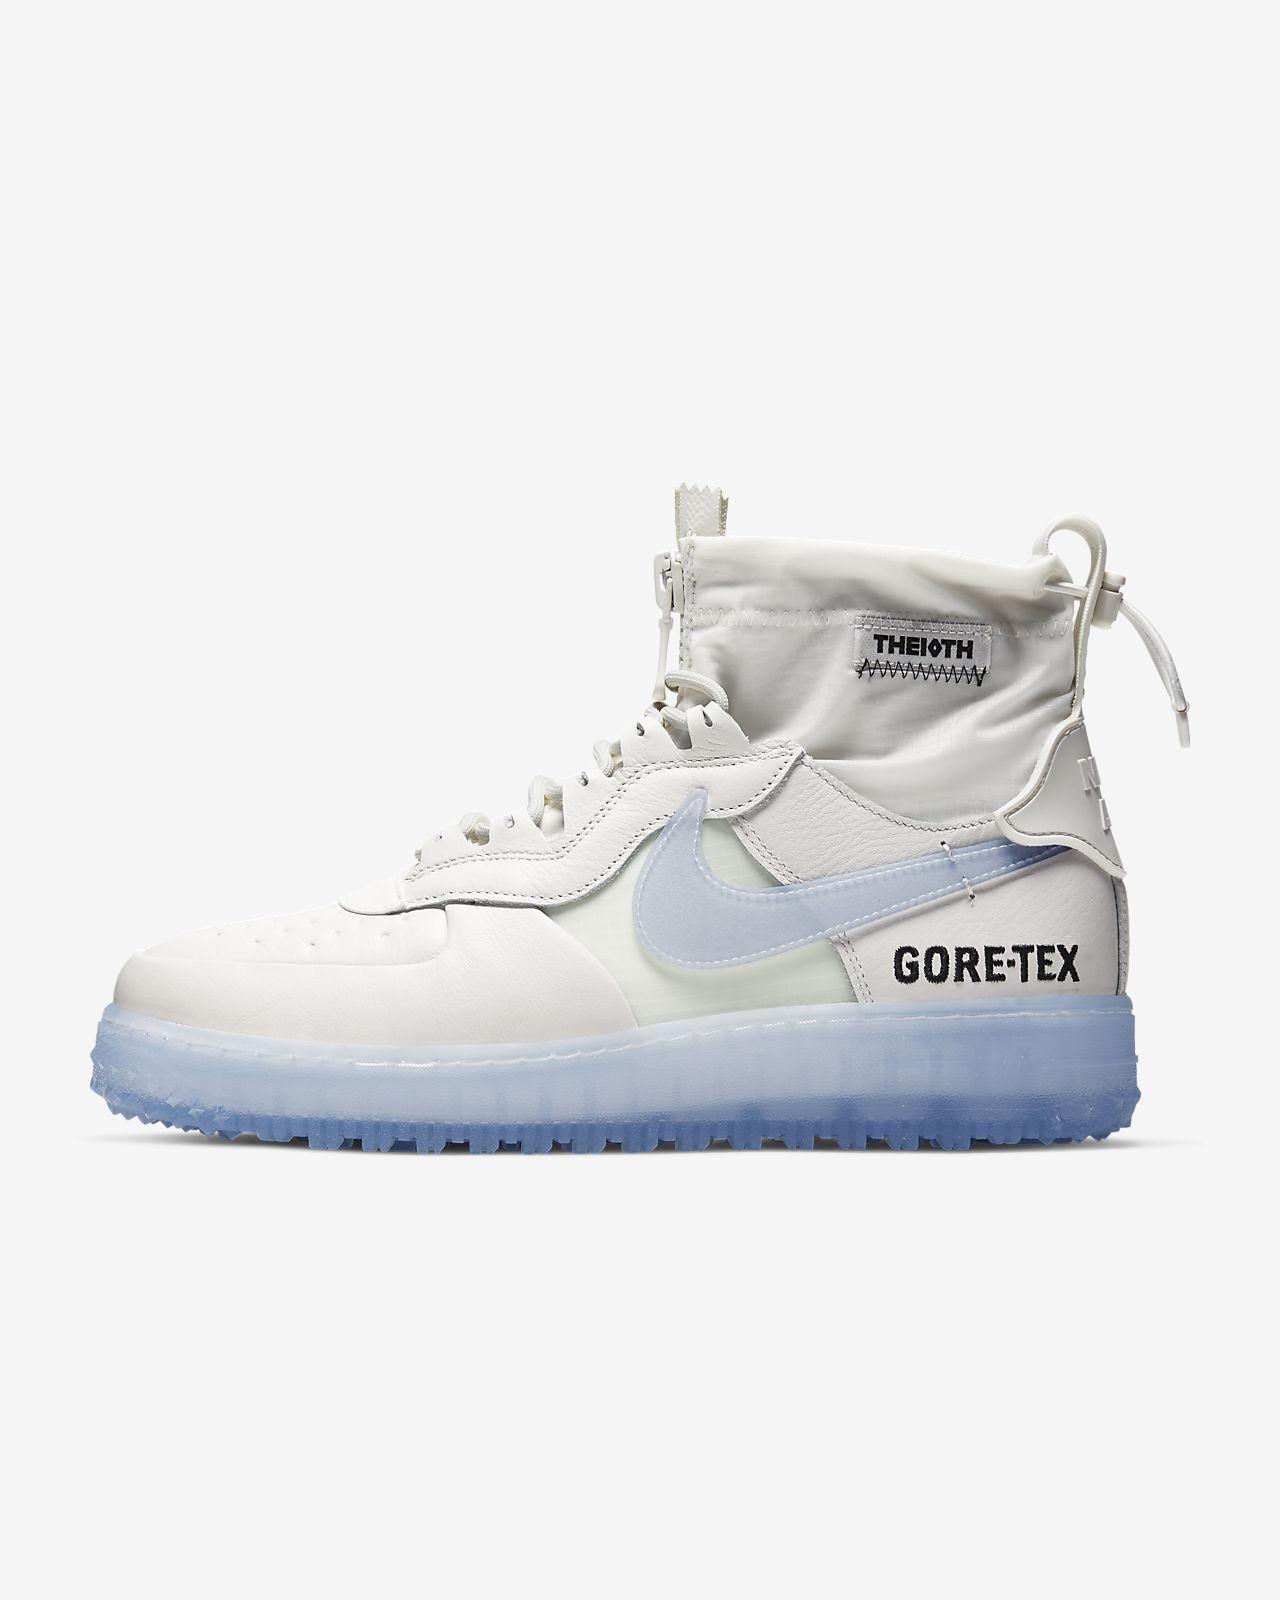 Botte Nike Air Force 1 Winter GORE-TEX